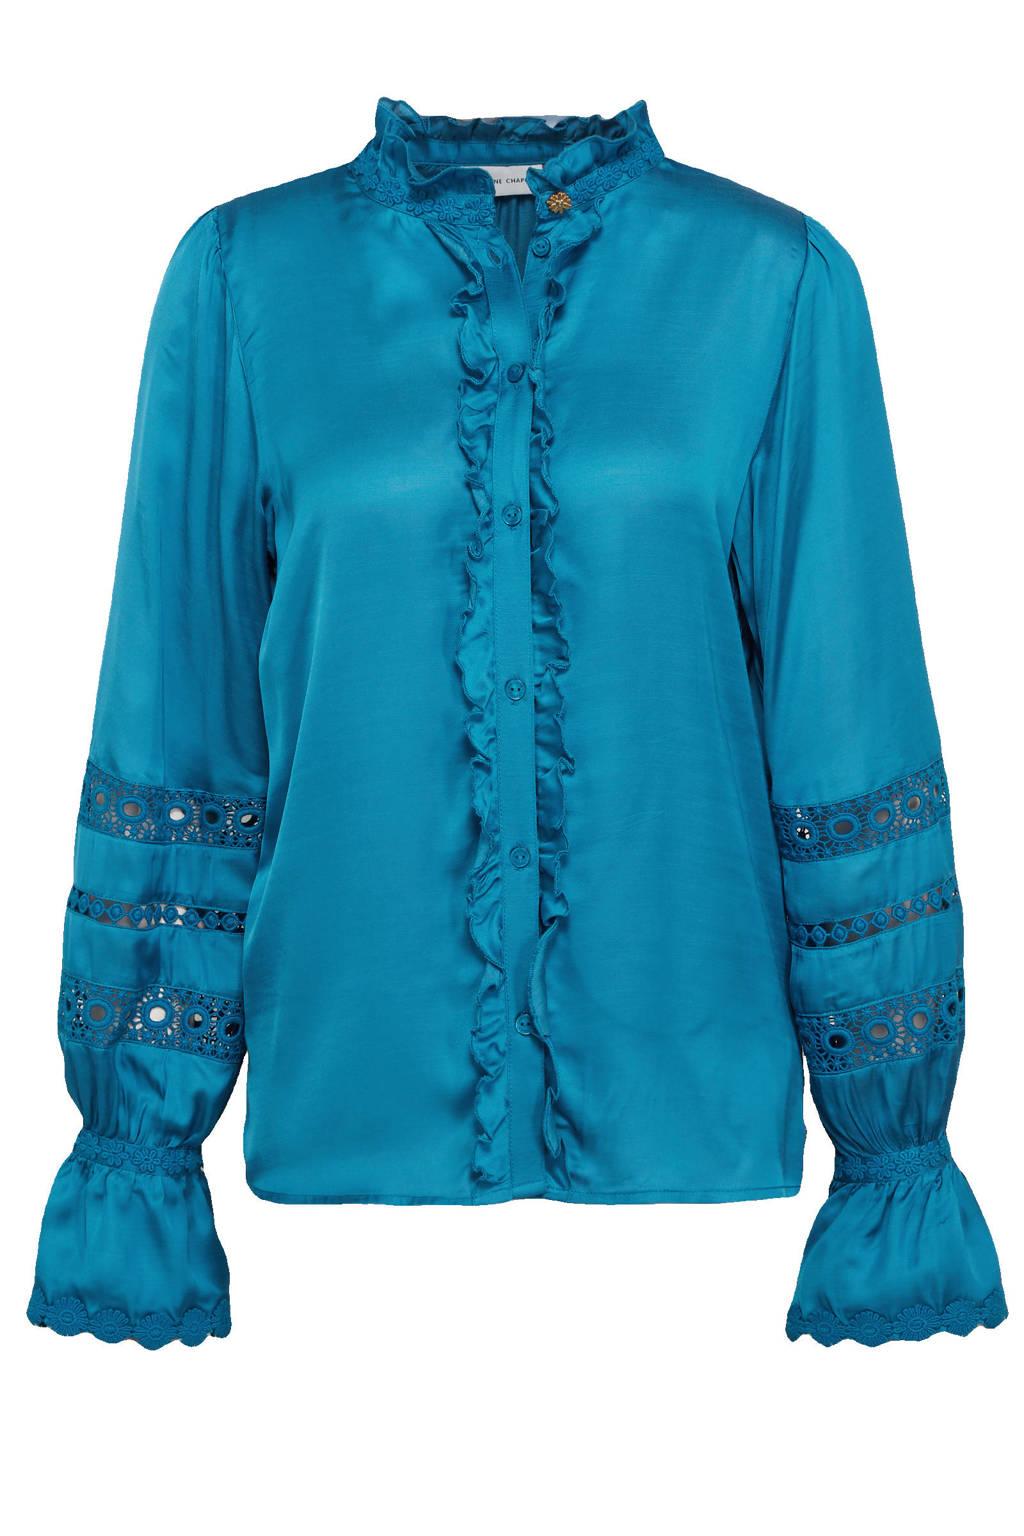 Fabienne Chapot blouse Boho met ruches blauw, Blauw